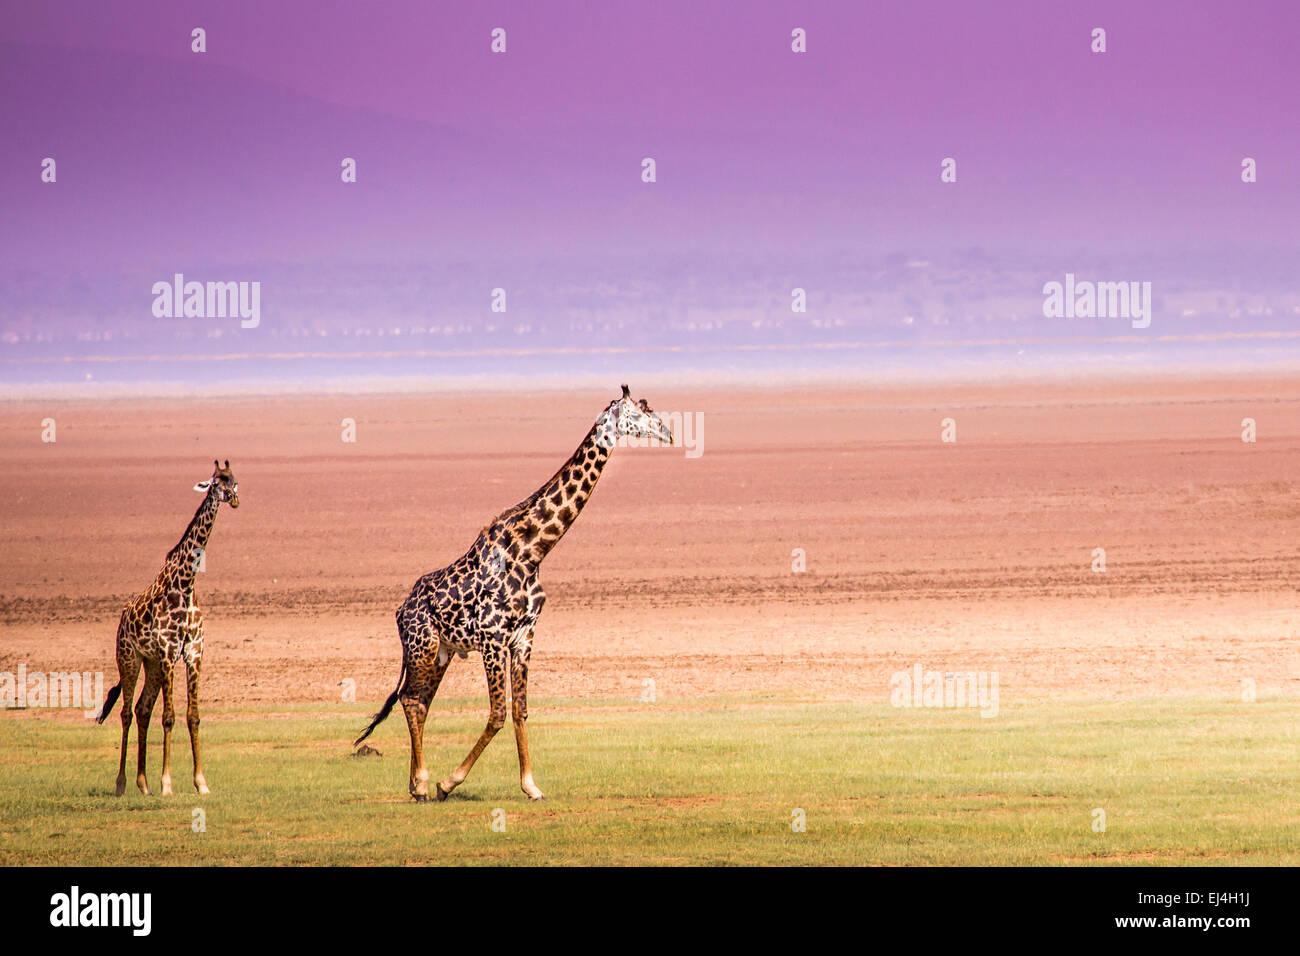 Giraffes in Lake Manyara national park, Tanzania - Stock Image